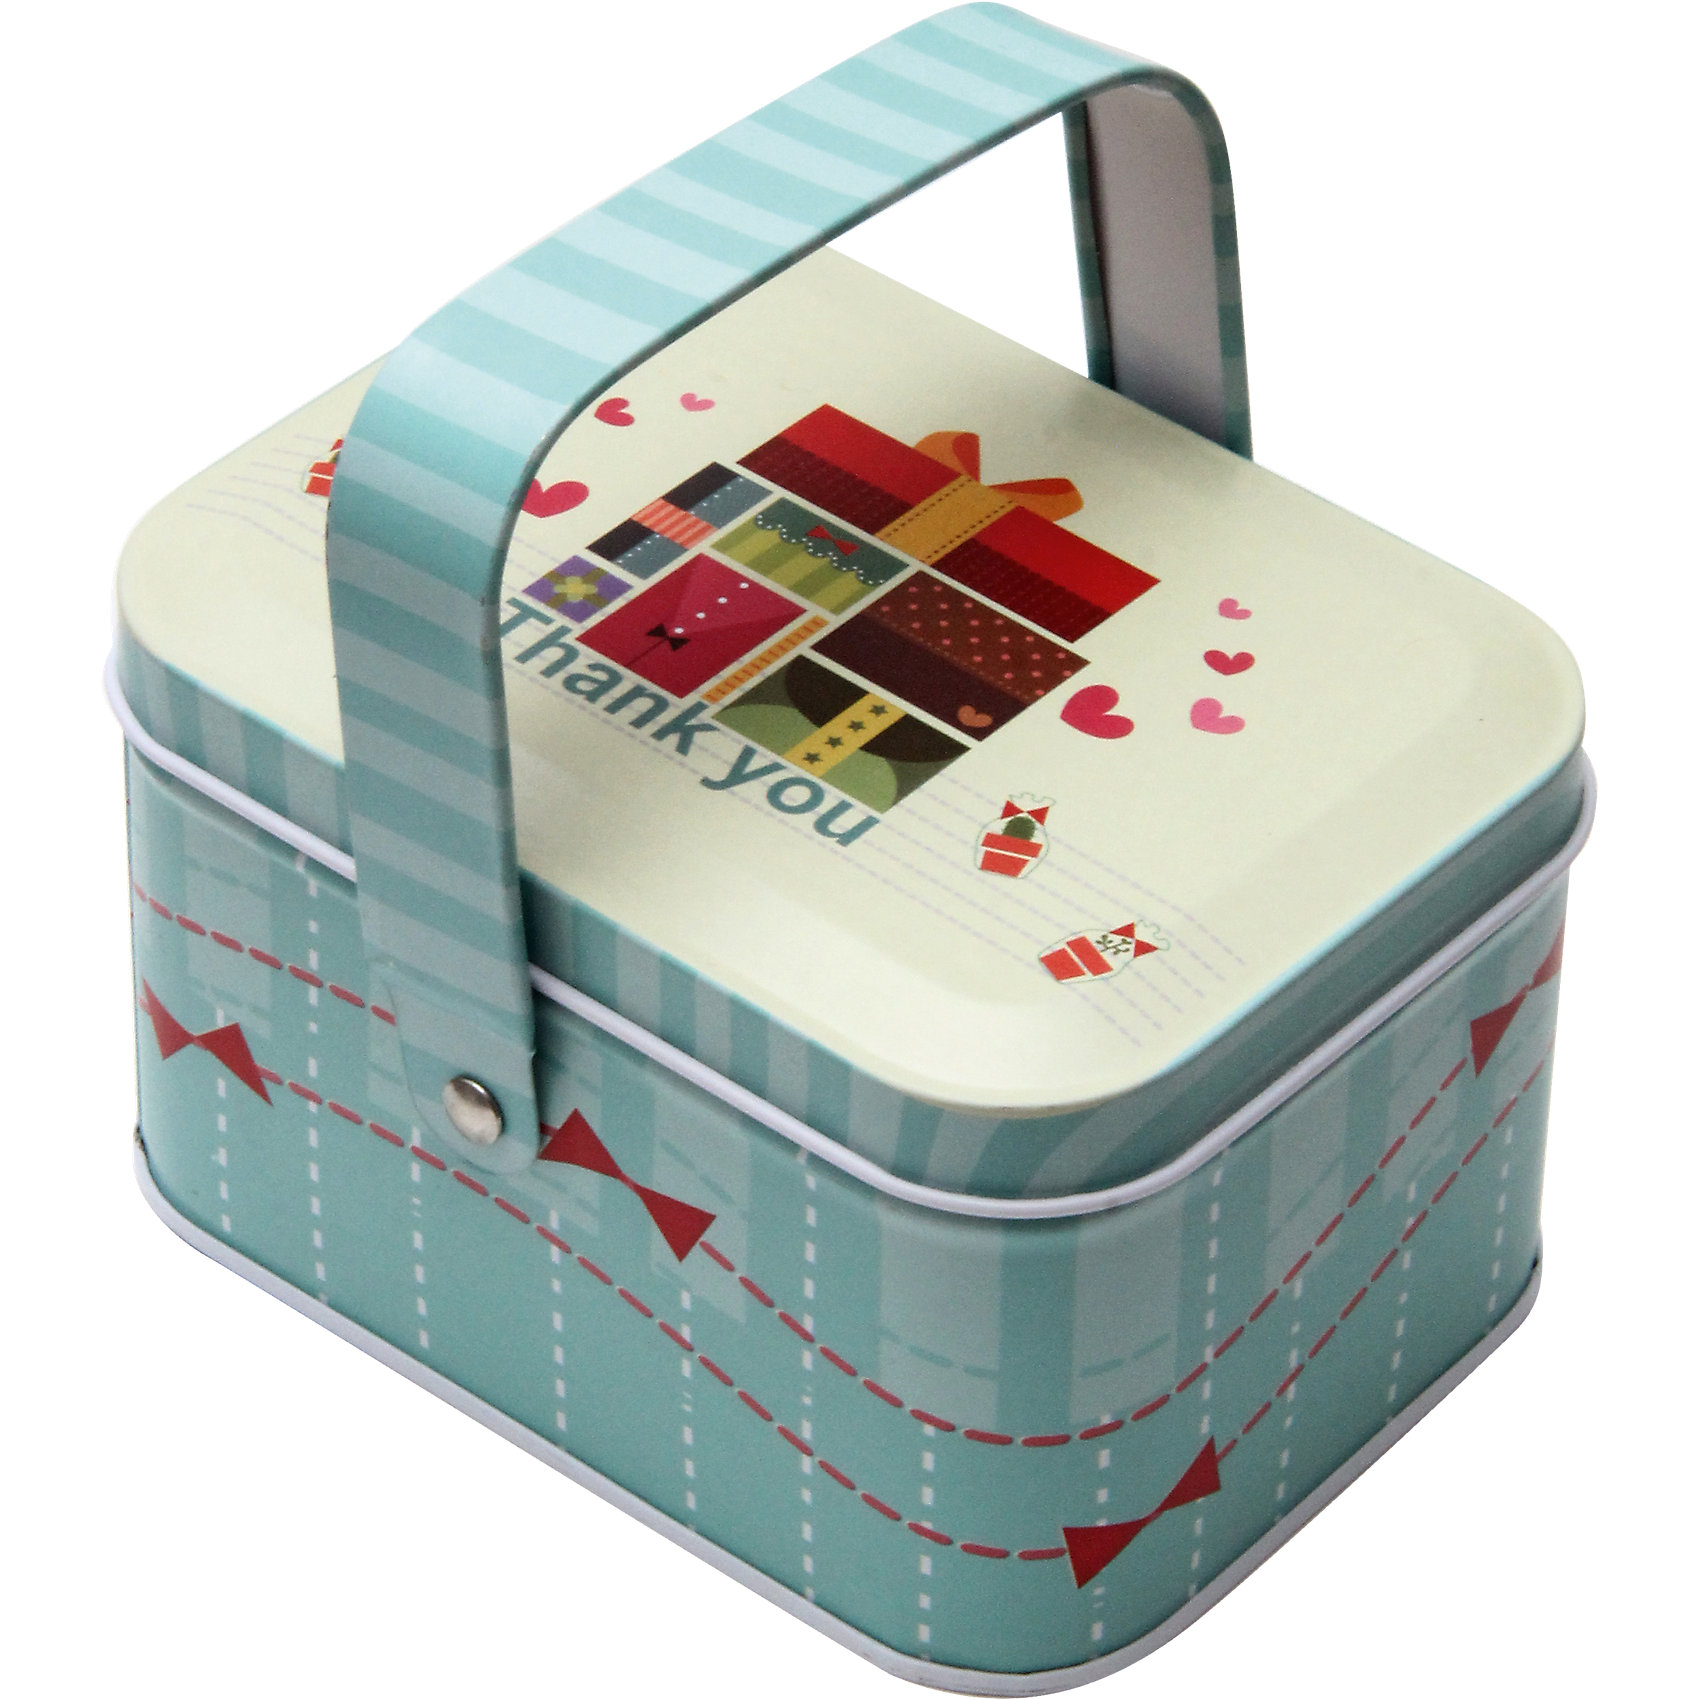 Феникс-Презент Коробка для мелочей Подарки 10,5*8*6 см подсвечник декоративный феникс презент цвет розовый 8 5 х 8 5 х 7 5 см